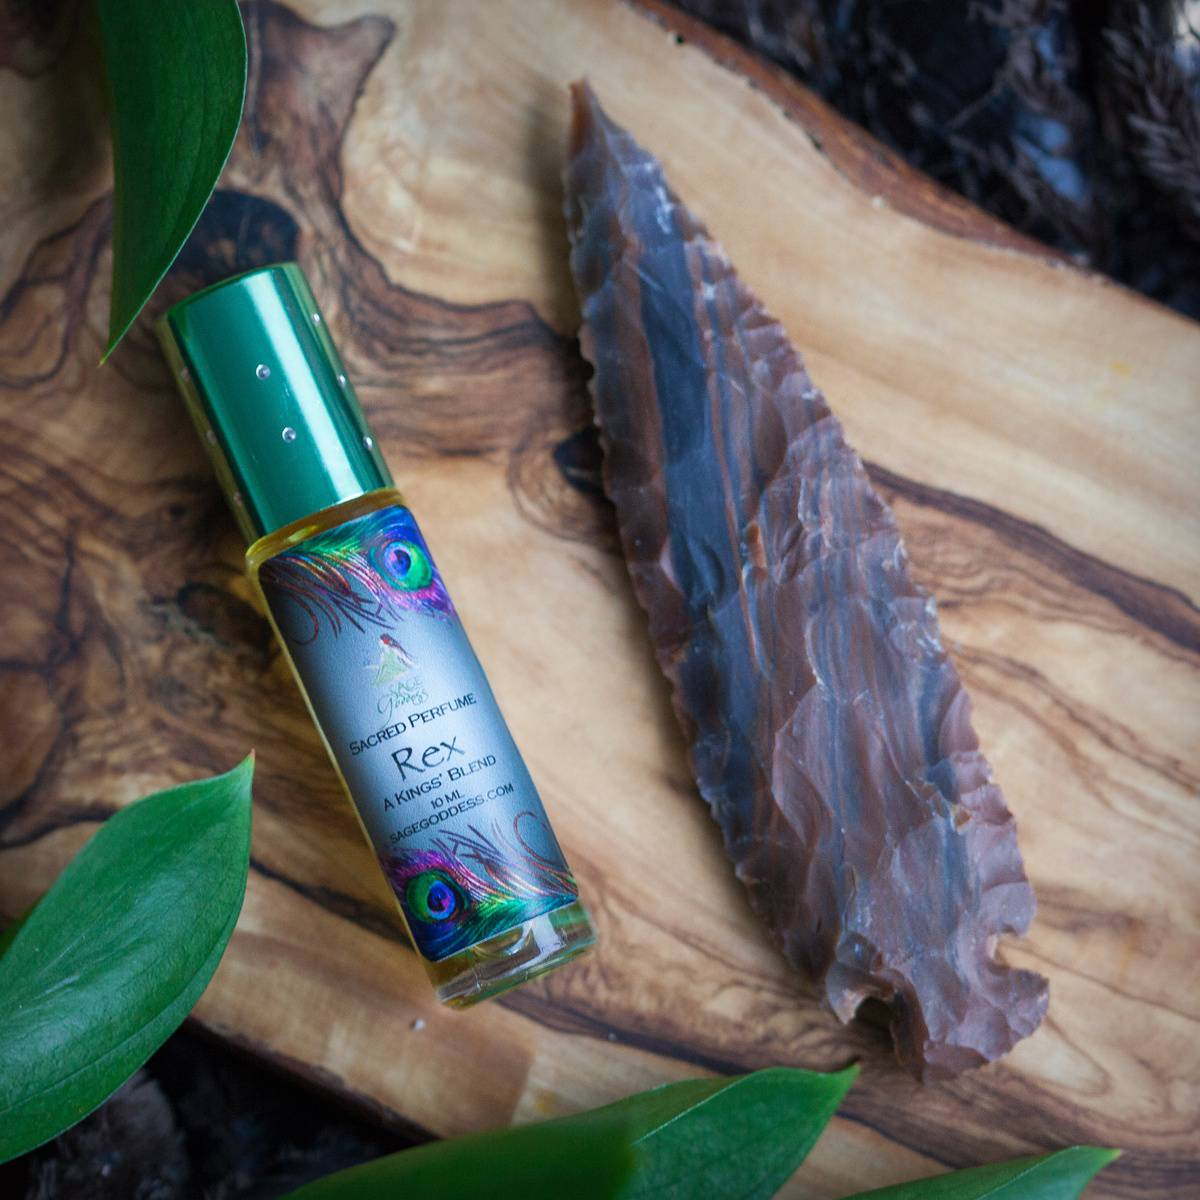 Indian Agate Arrowhead with Rex Perfume 3_6